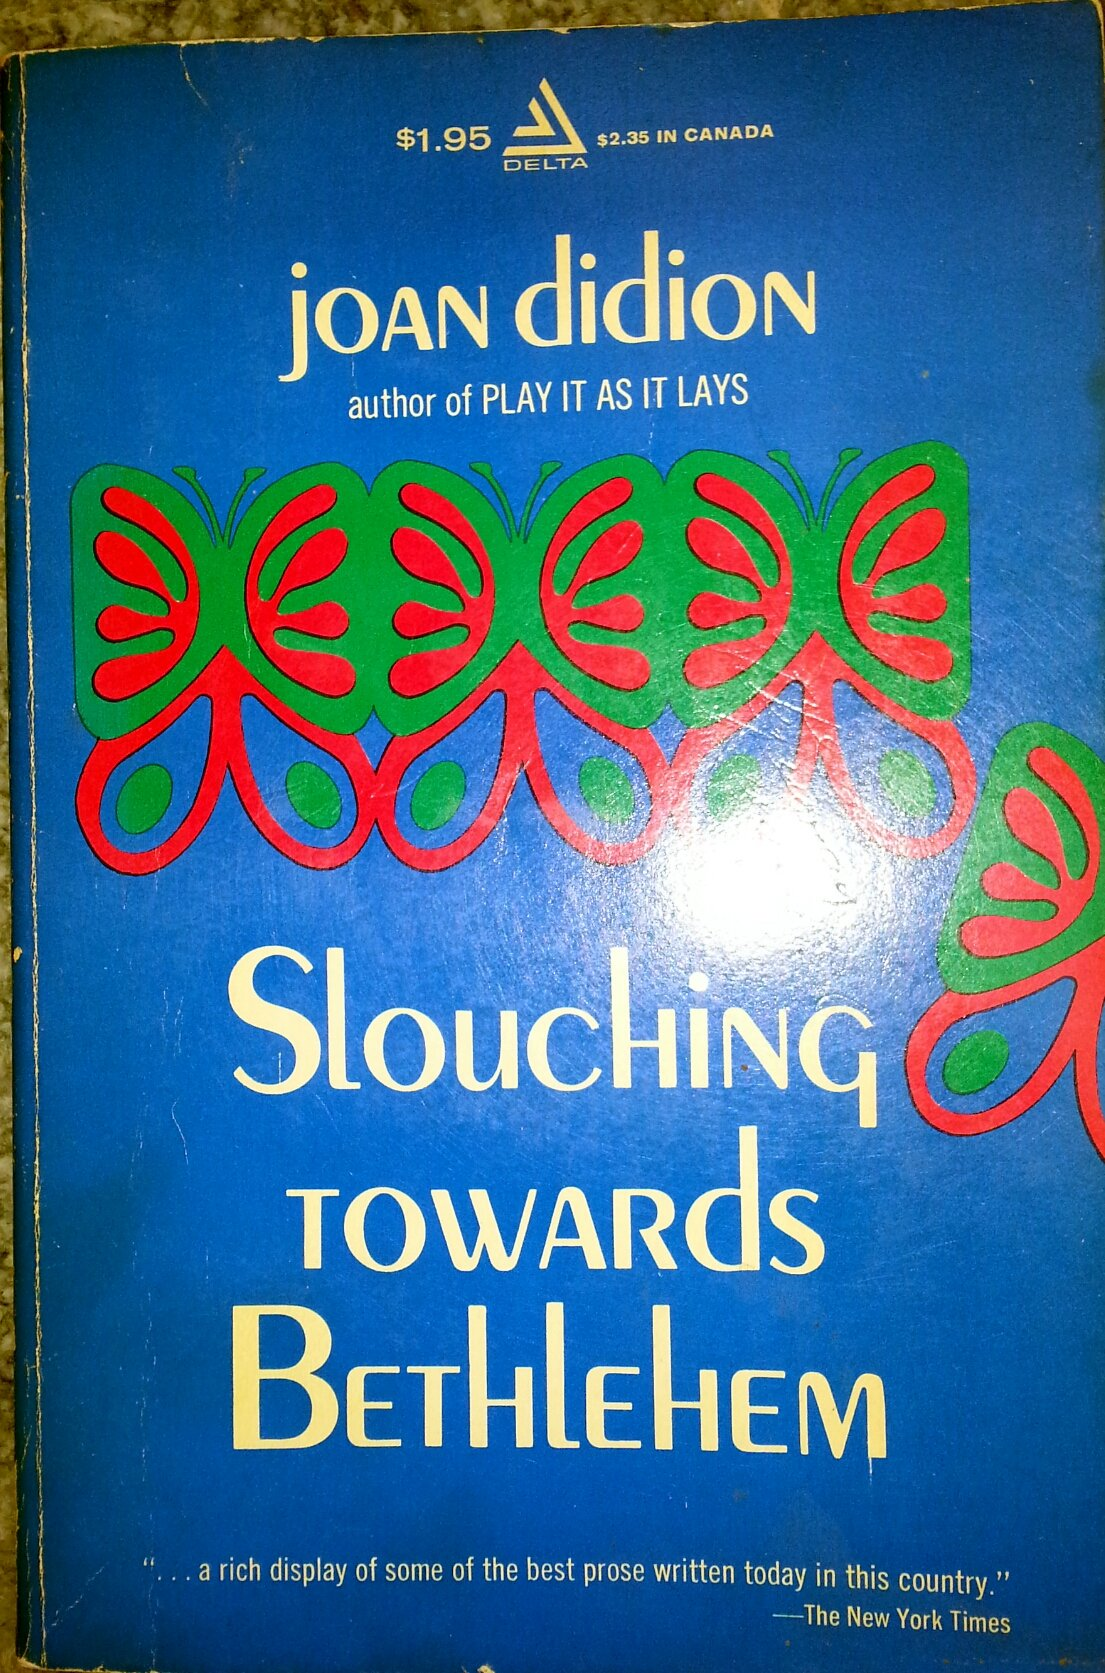 High School Sample Essay  English Class Essay also English Extended Essay Topics Slouching Toward Bethlehem Joan Didion Amazoncom Books Analysis Essay Thesis Example